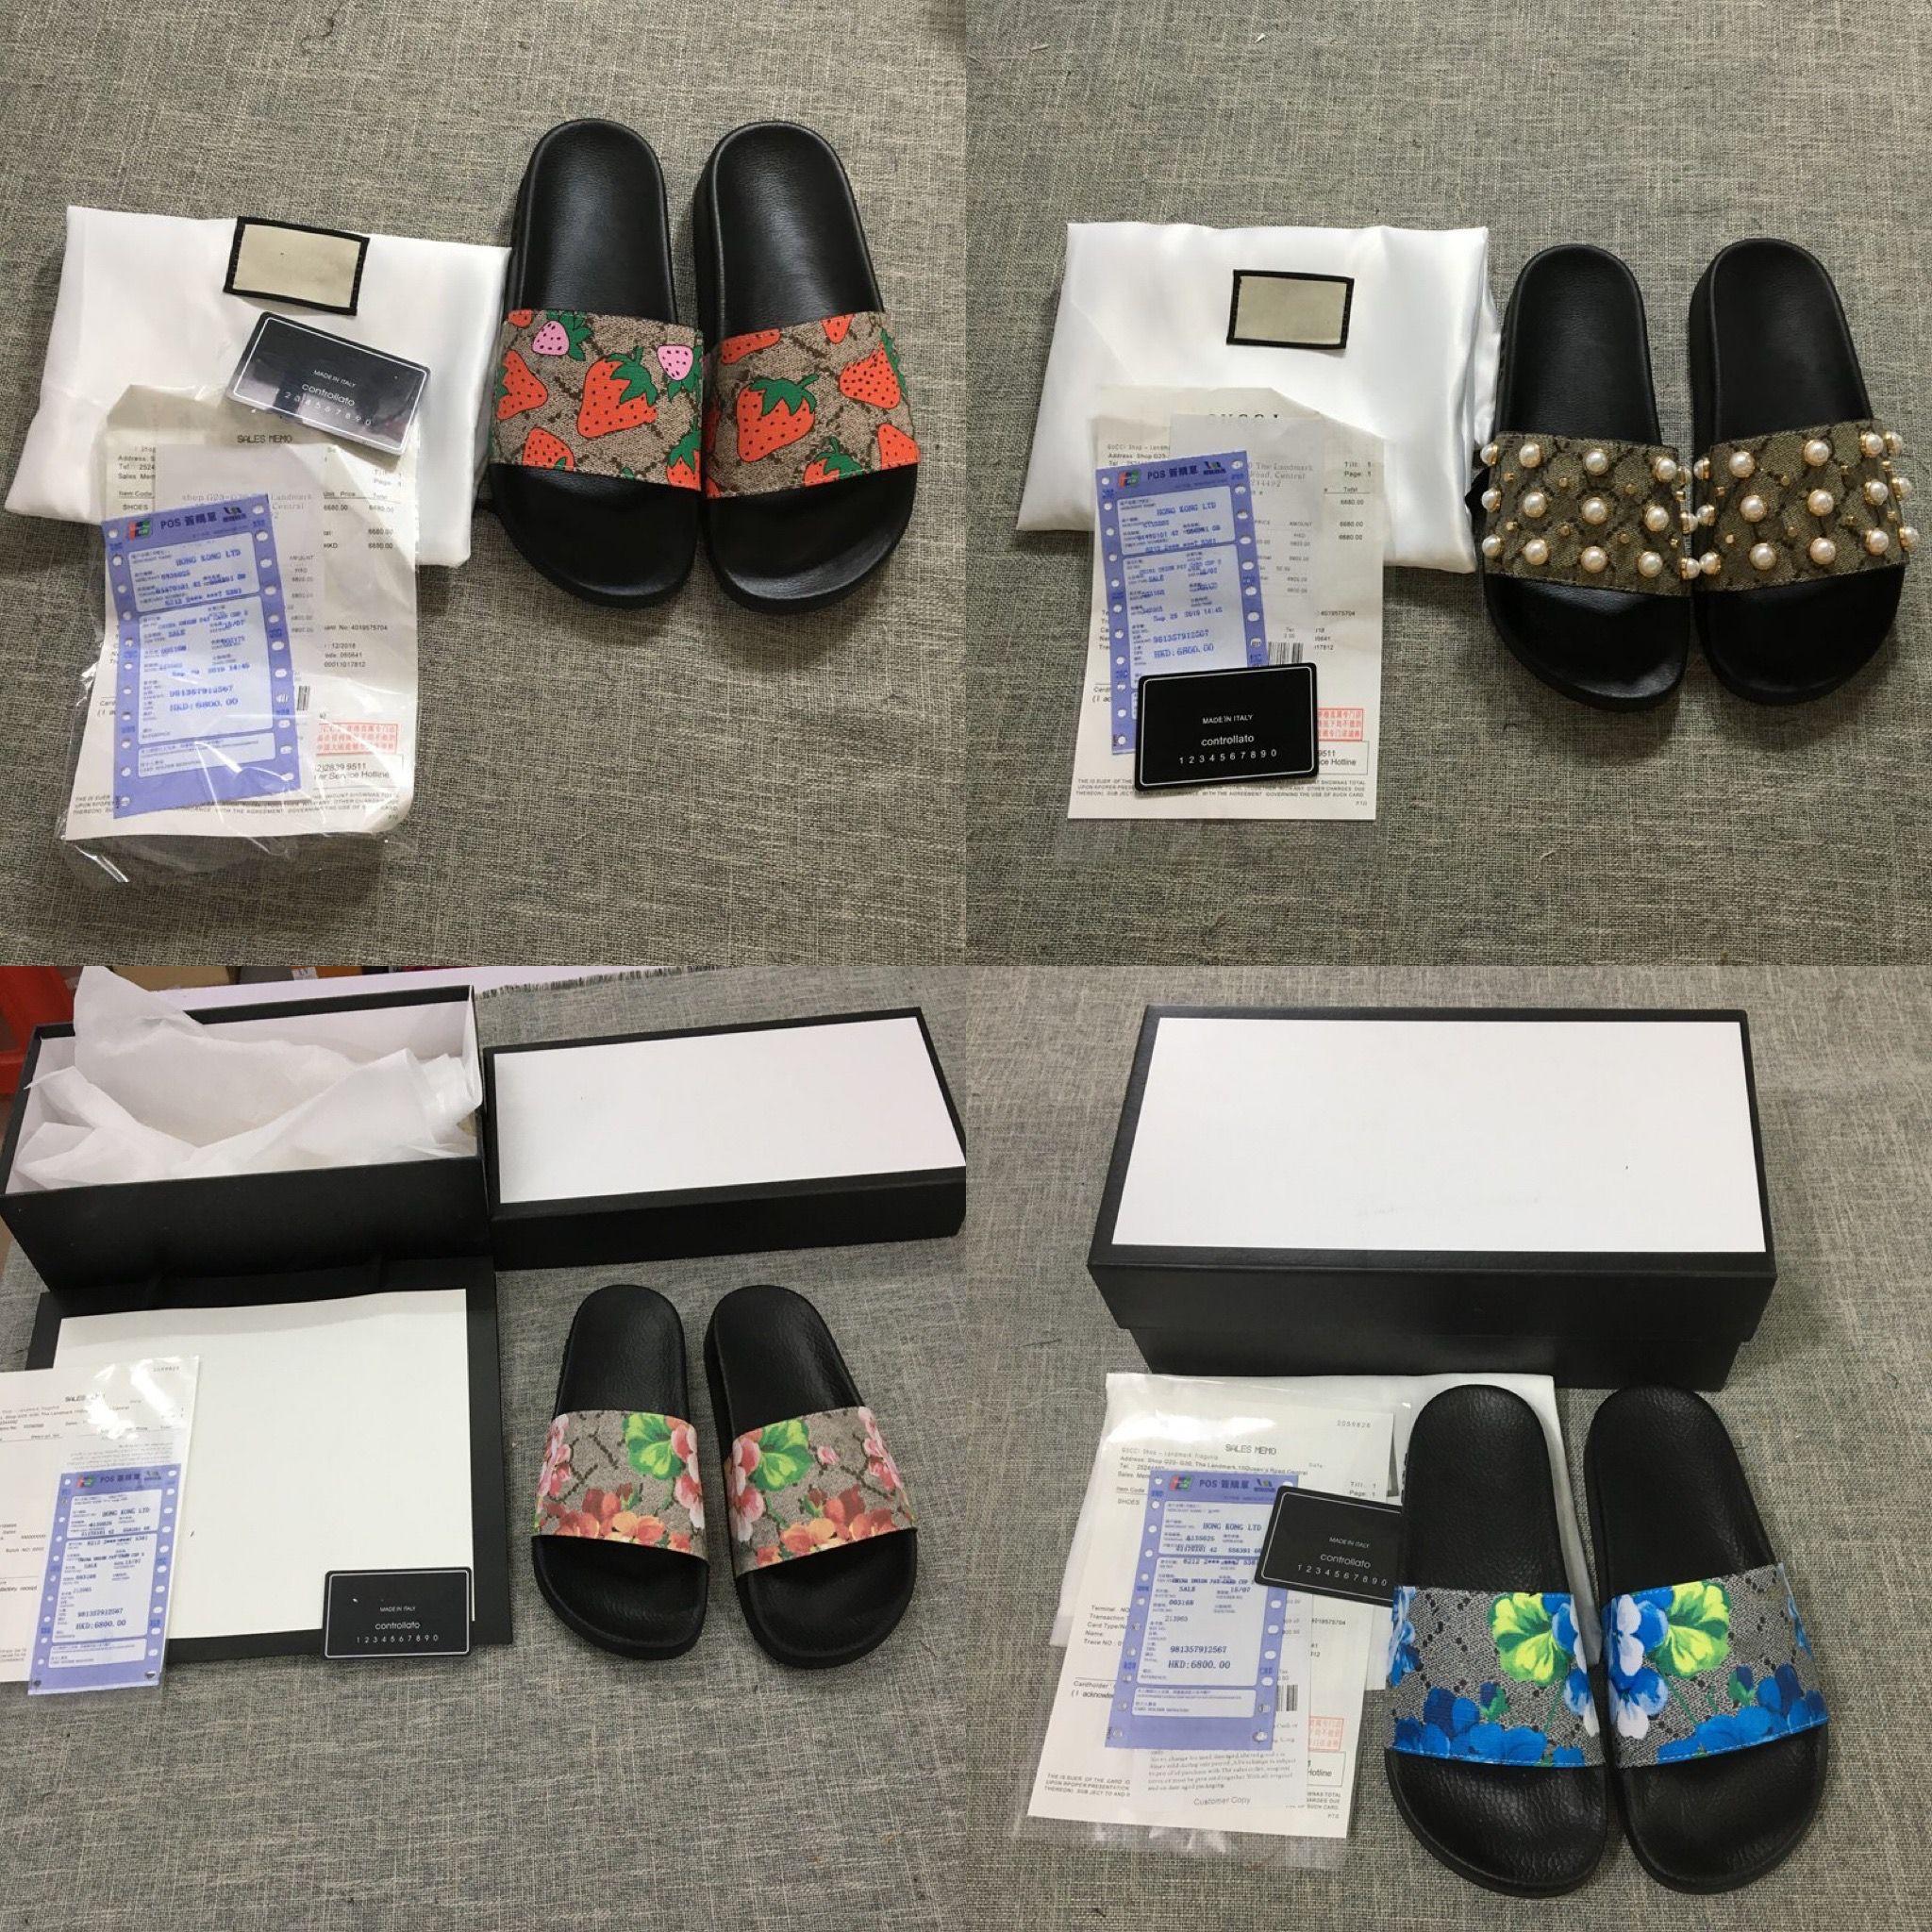 Designer Shoes diapositive Summer Beach Designer Indoor Sandali Casa Designer Infradito Coppie pantofole